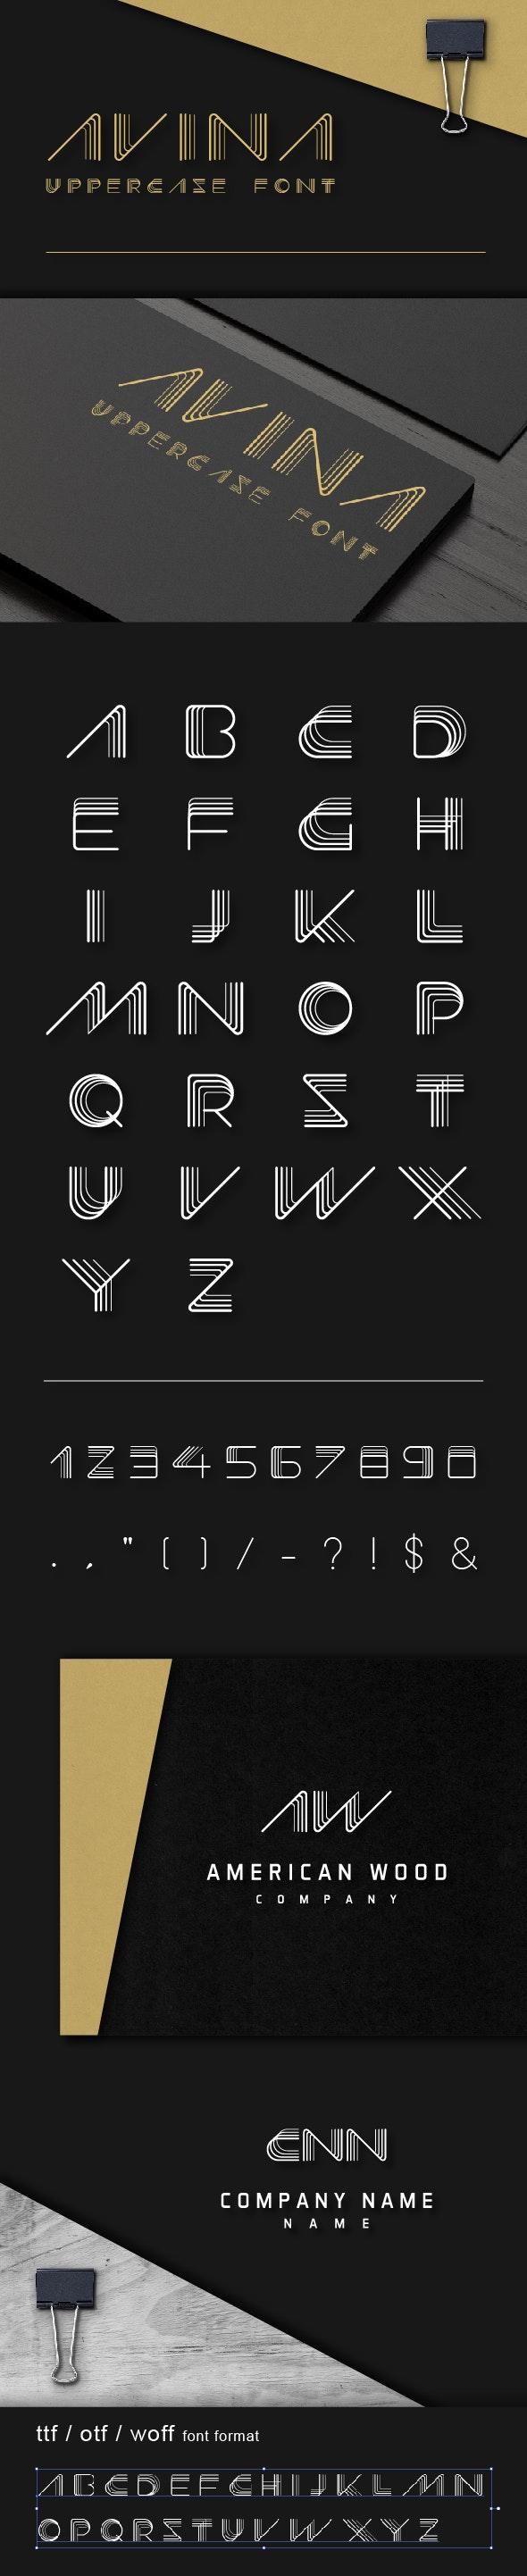 Avina Uppercase Font - Futuristic Decorative